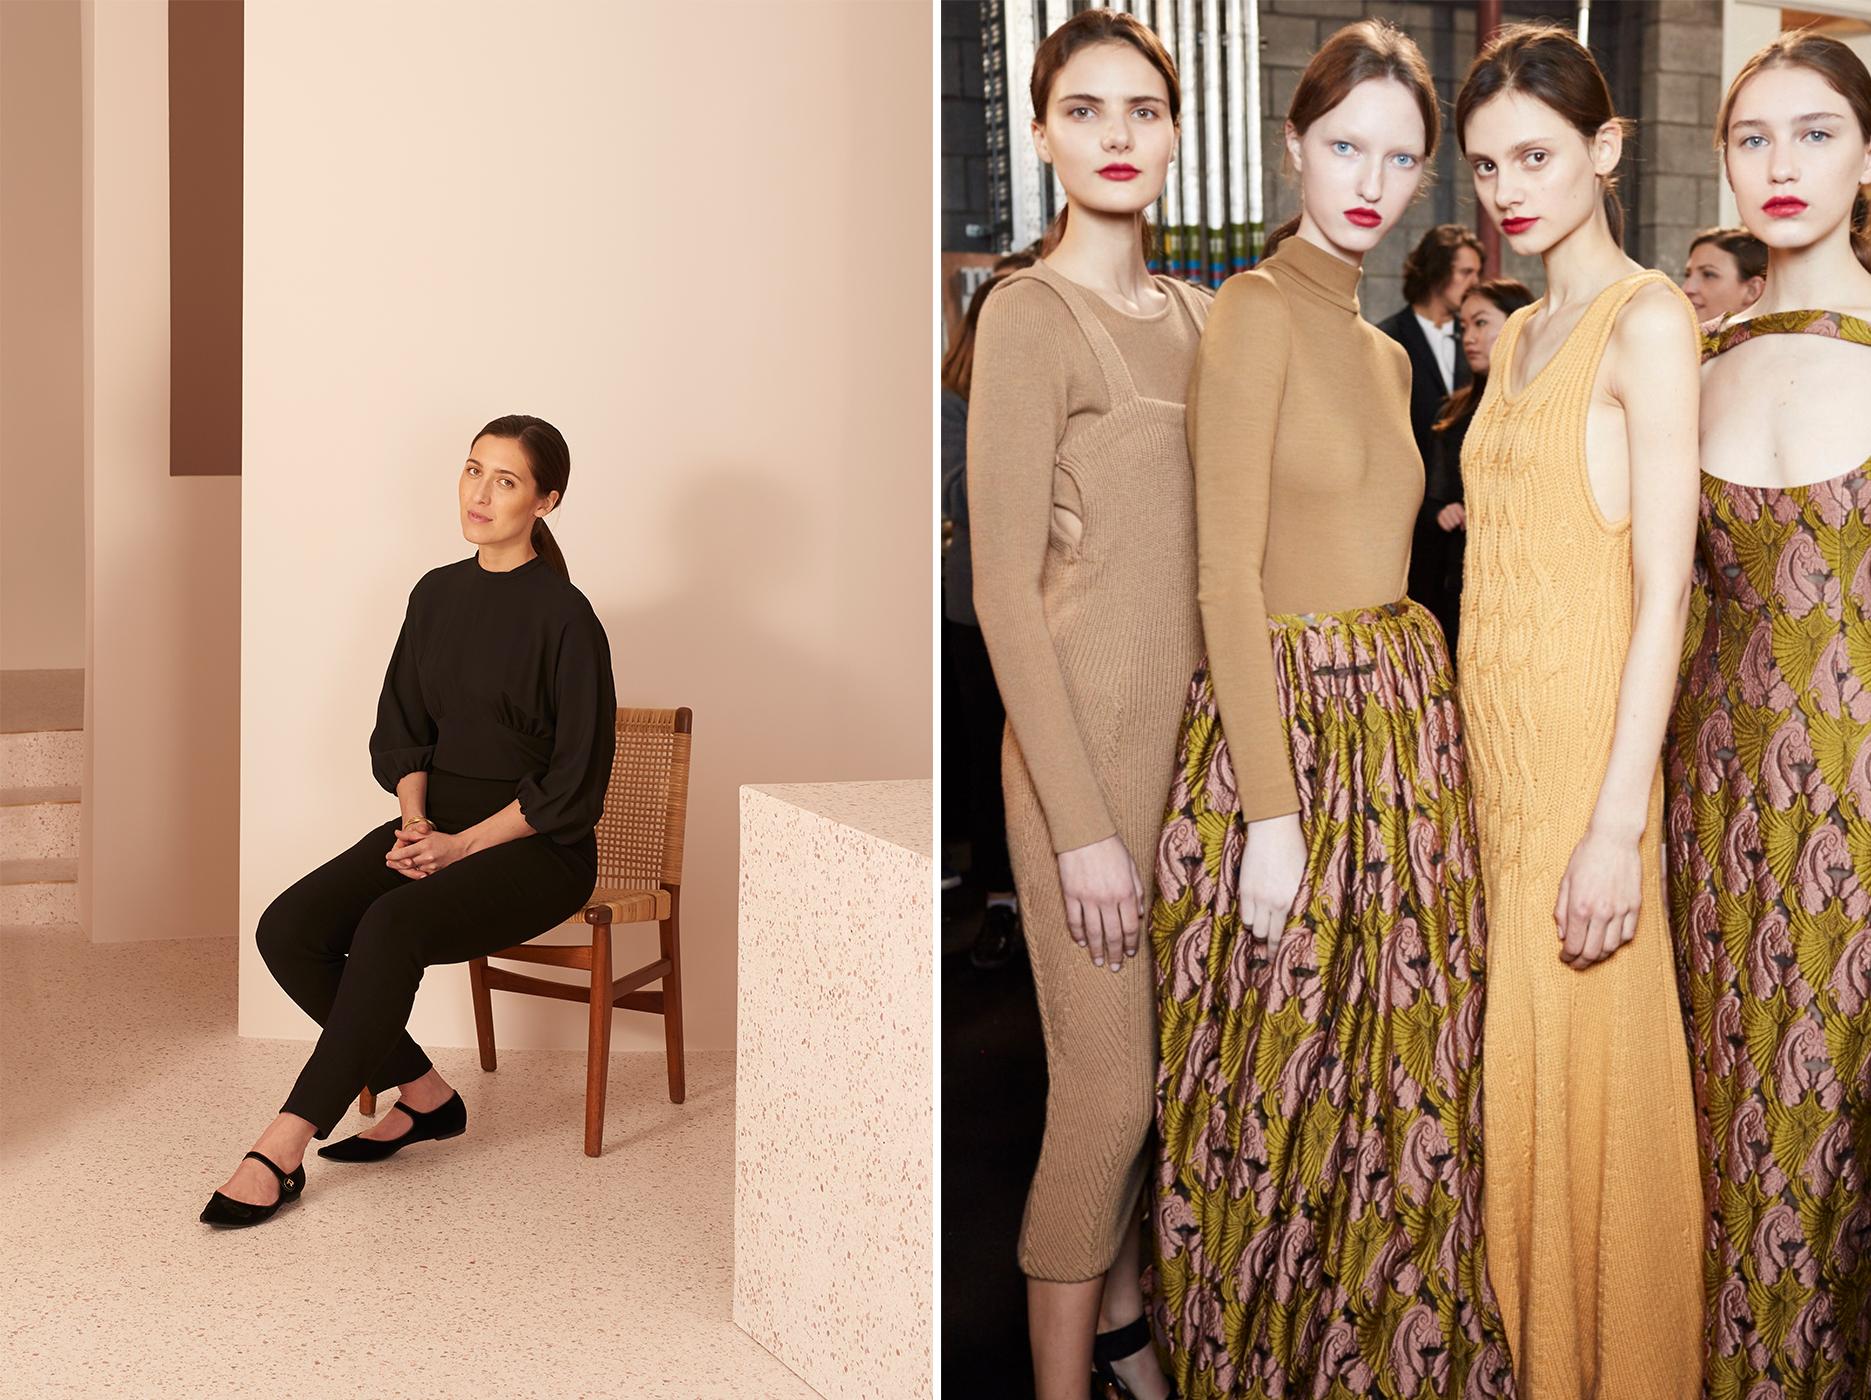 Categories: Fashion-Trends - Emilia Wickstead